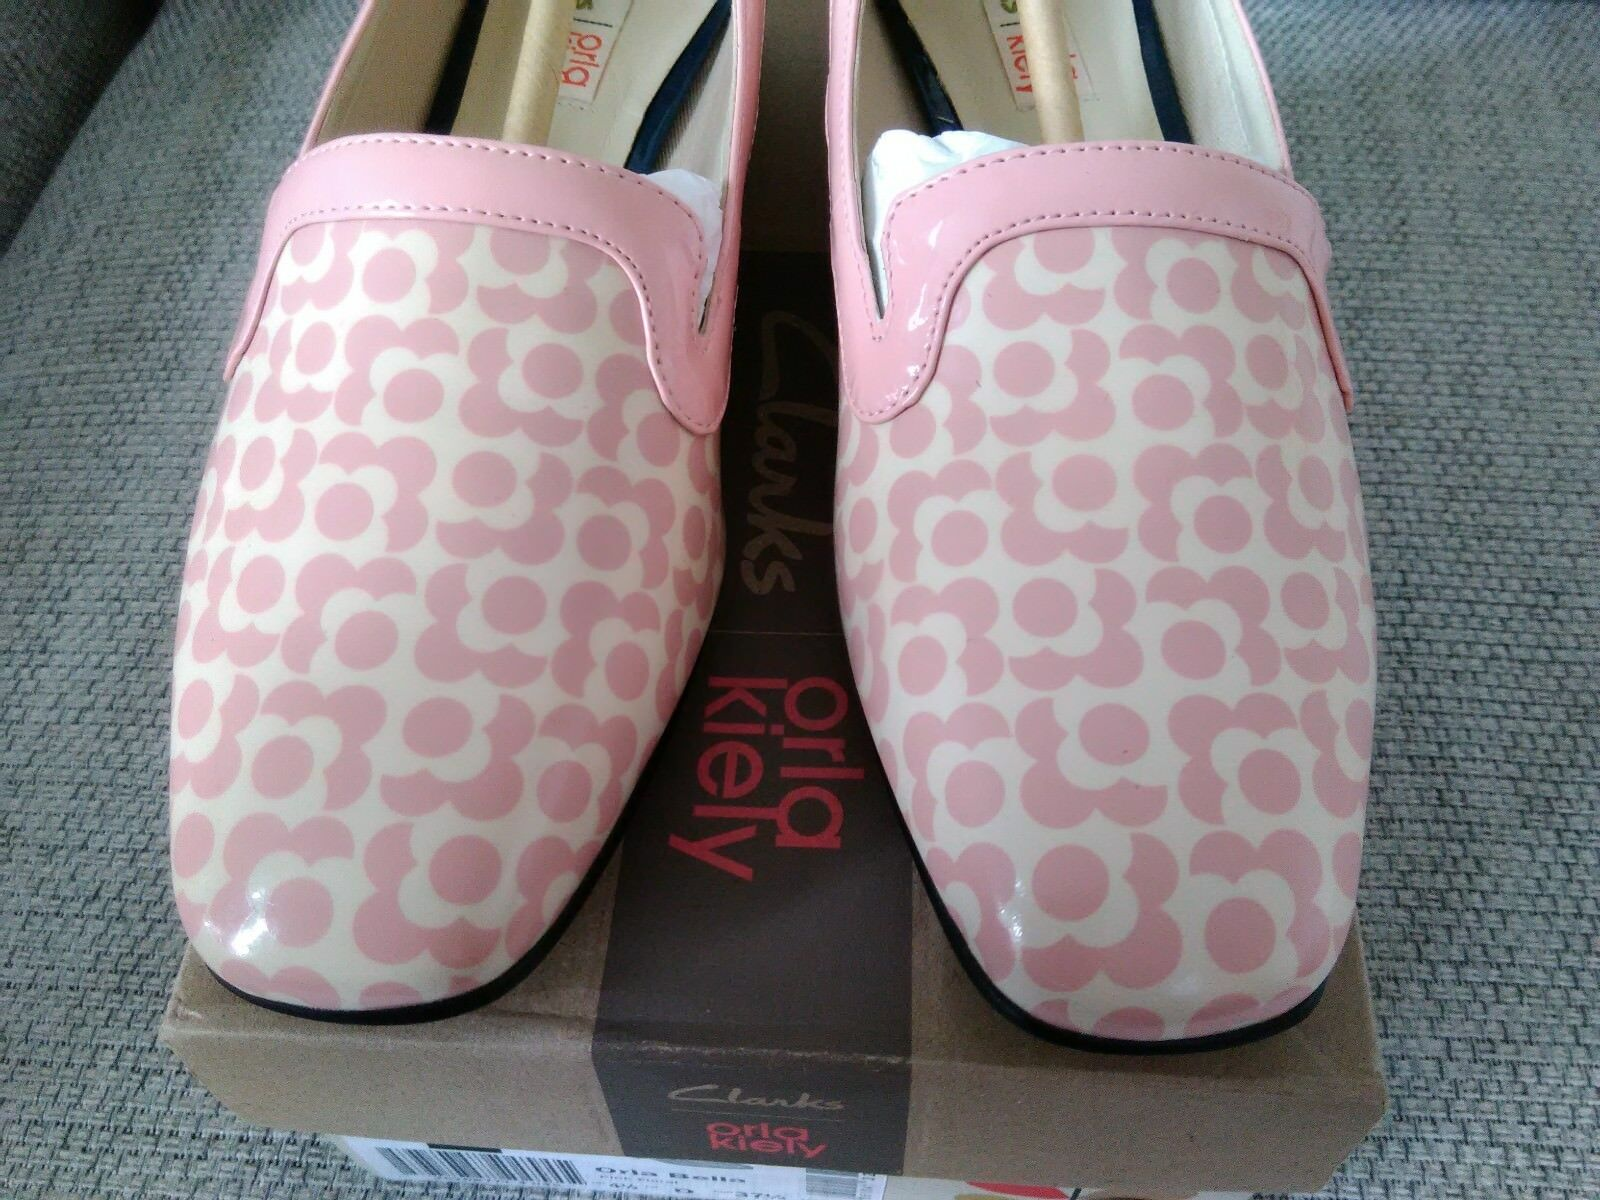 Orla Kiely Clark's, Bella Floral shoes, in pink, pink, pink, UK size 4.5, EUR 37.5, Retro 2840bd